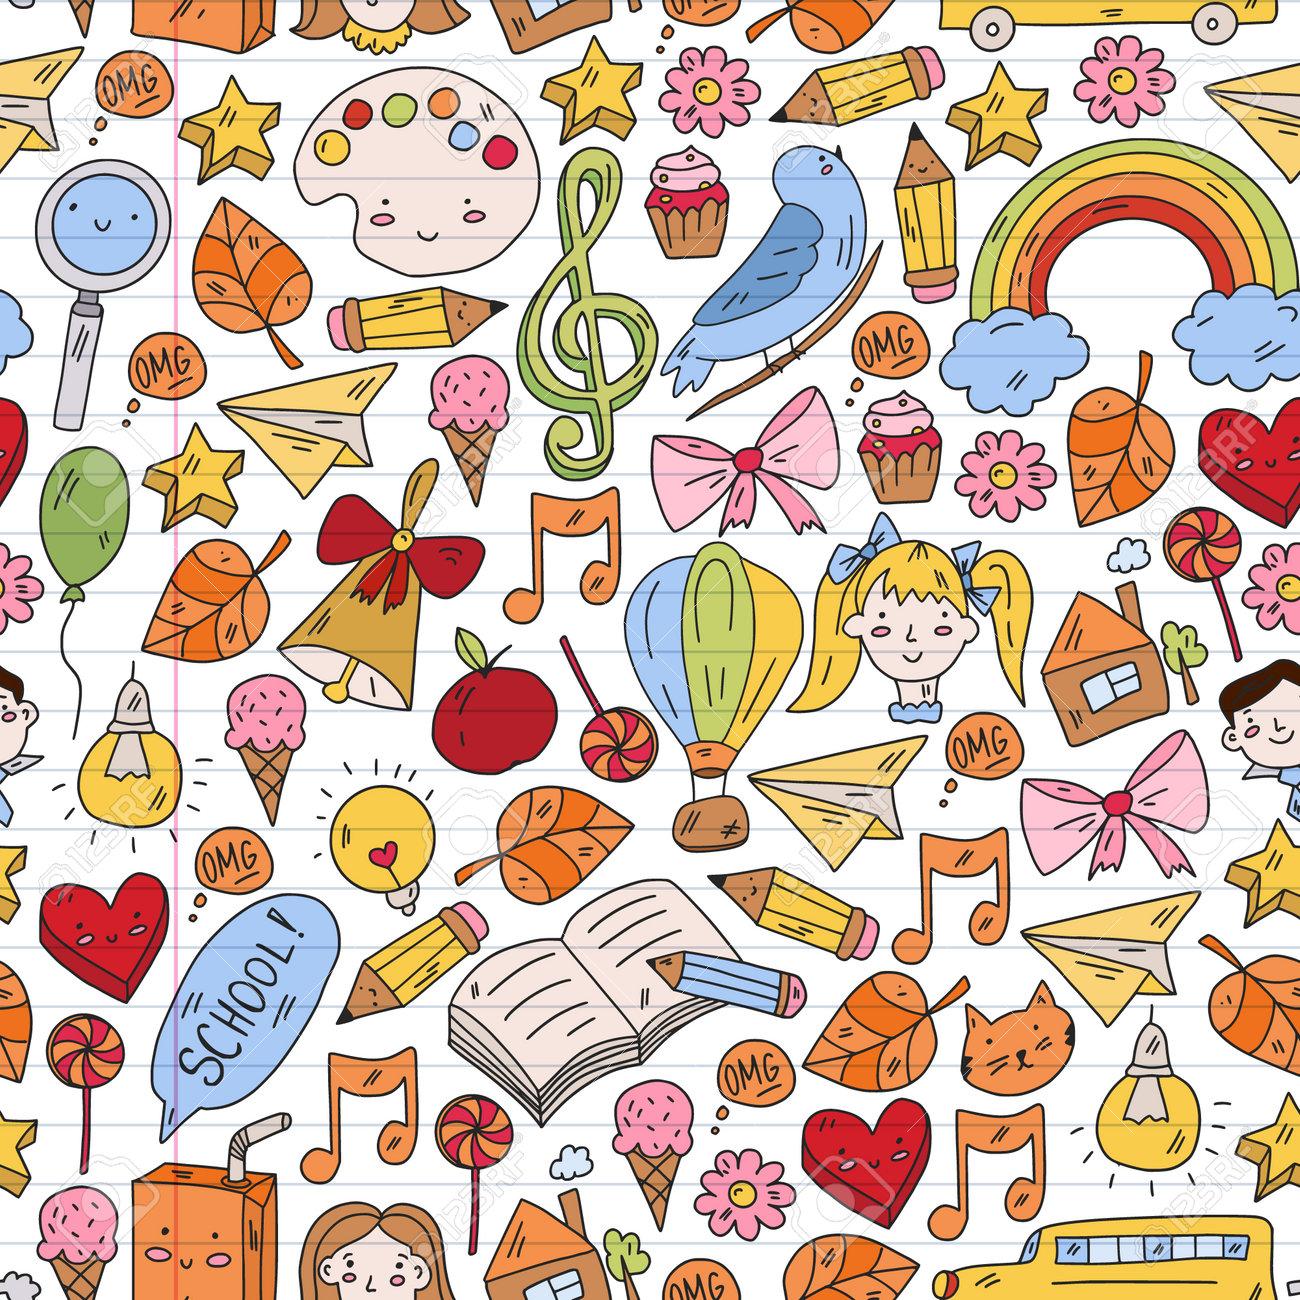 School, kindergarten with cute vector children. Creativity and imagination. Dancing, singing, painting, online education. - 173370438